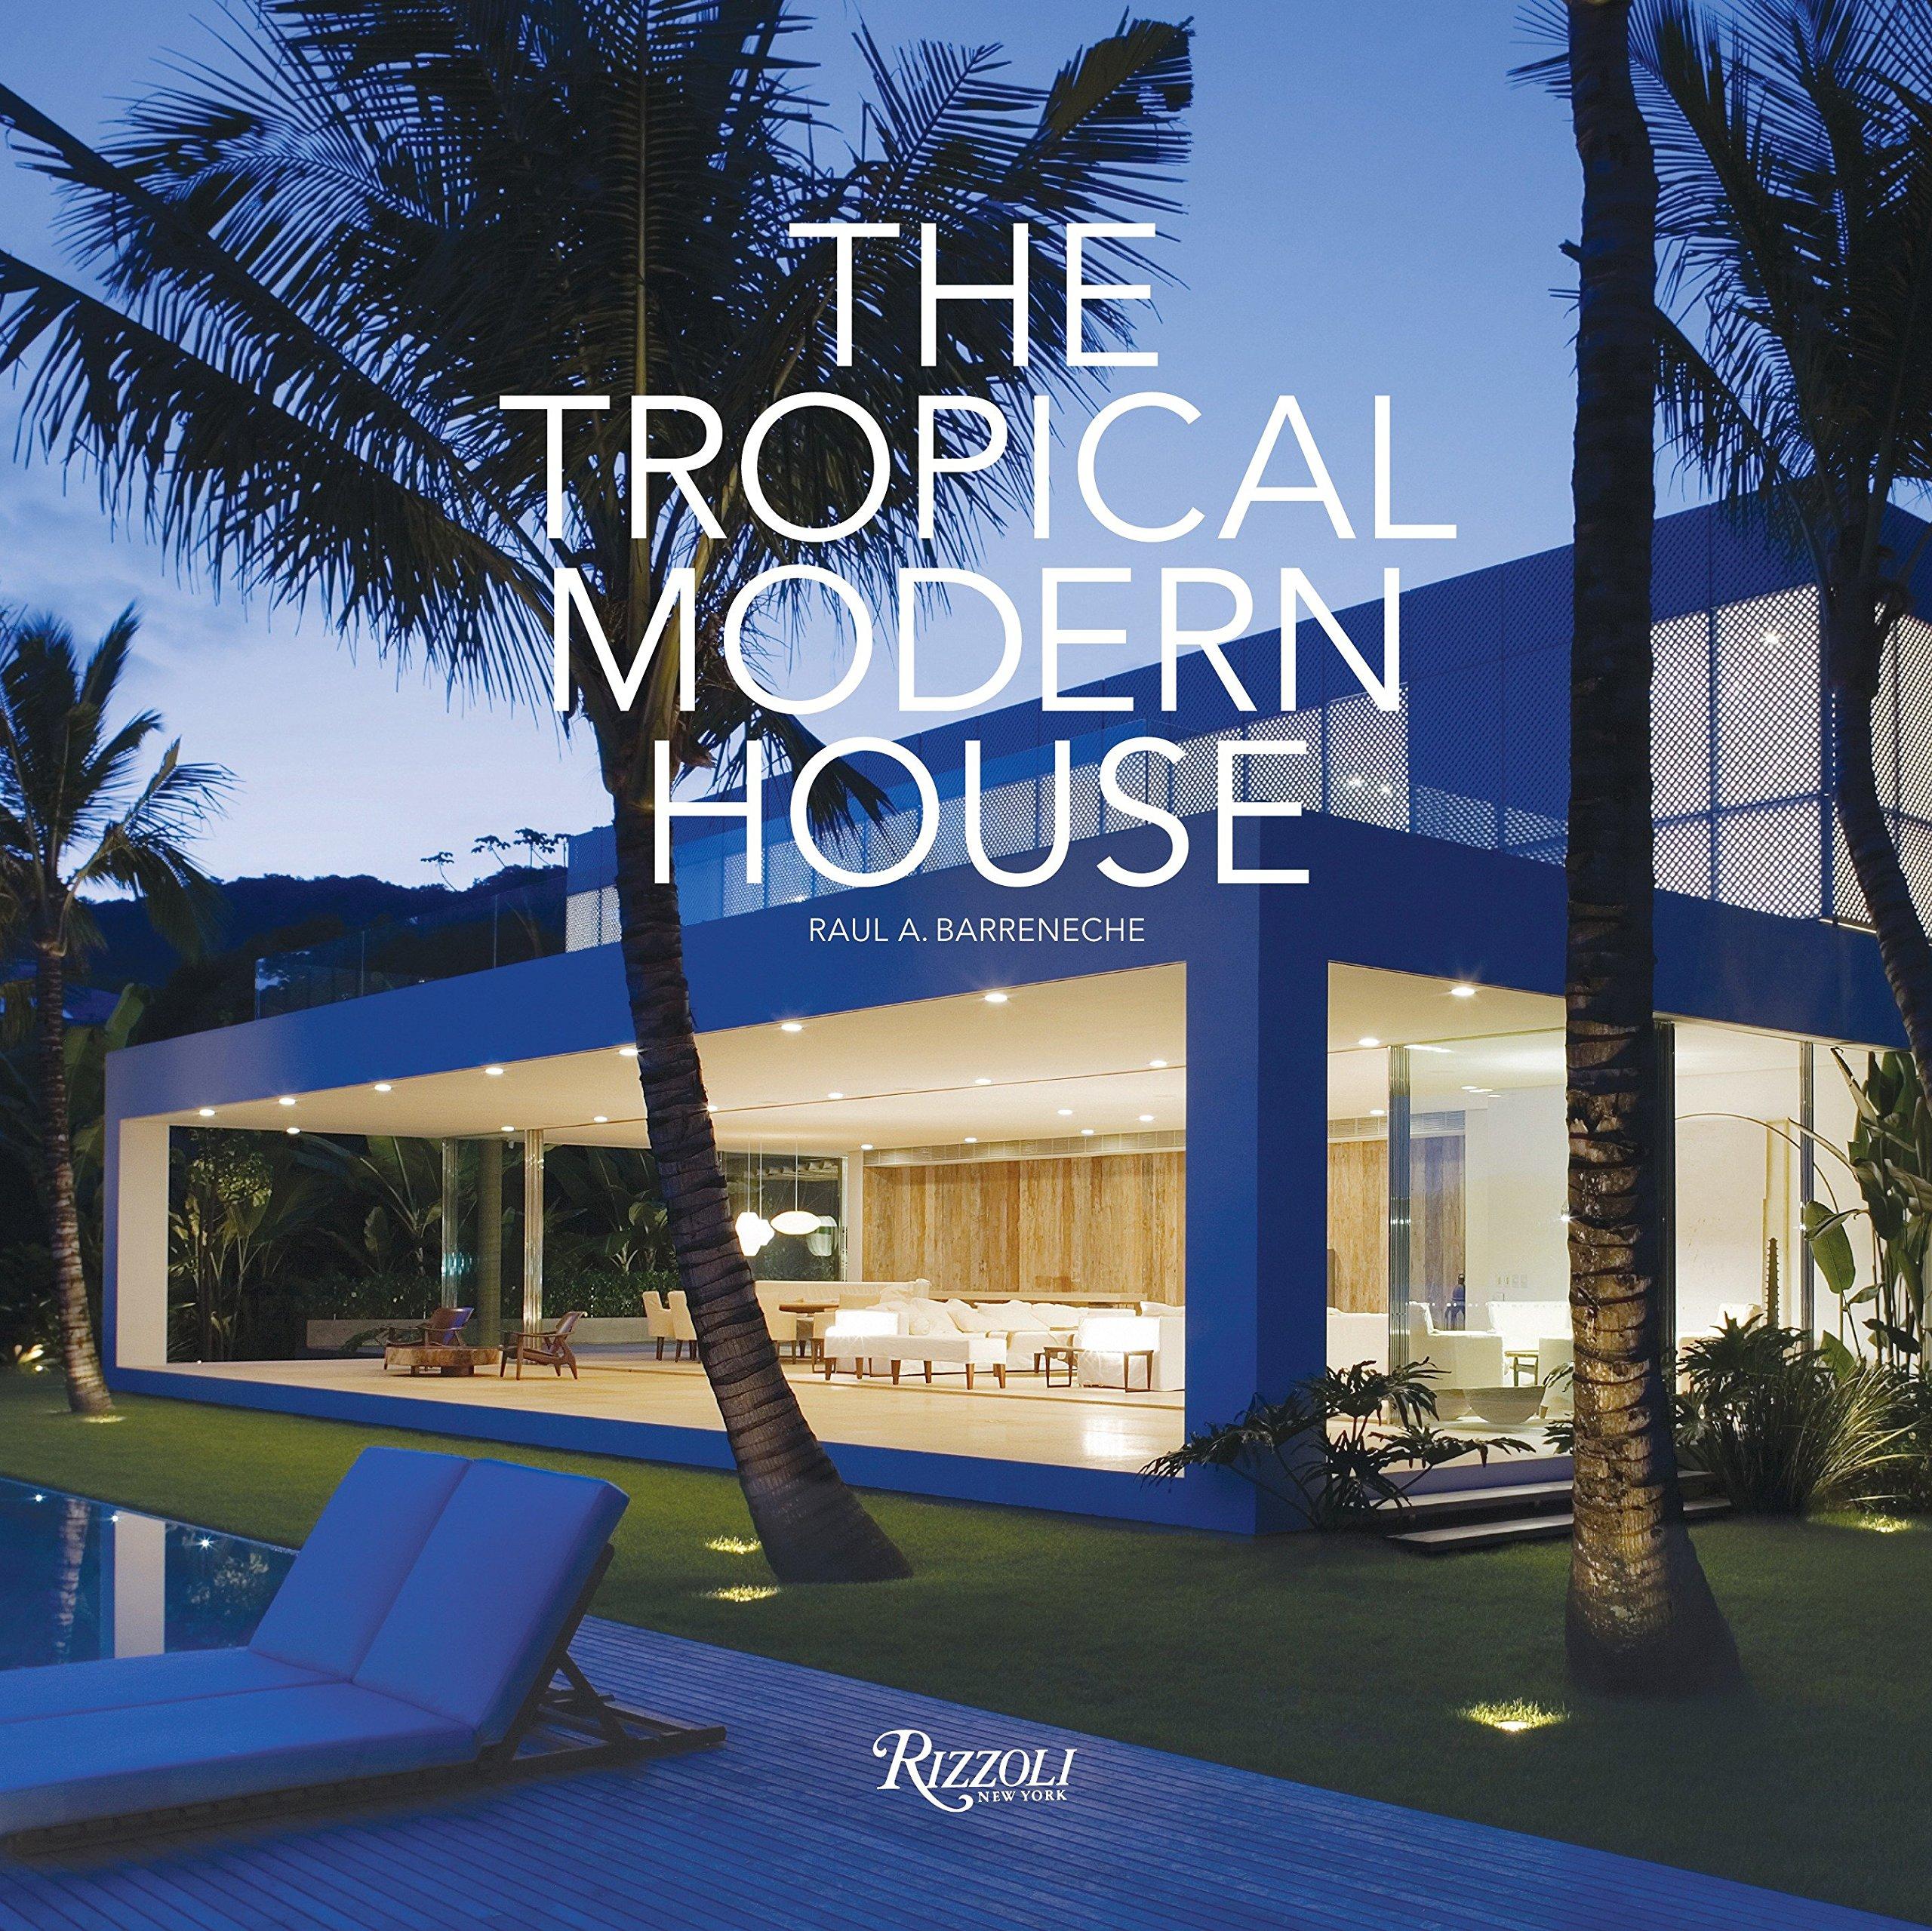 The Tropical Modern House: Raul A. Barreneche: 9780847834129: Amazon.com: Books